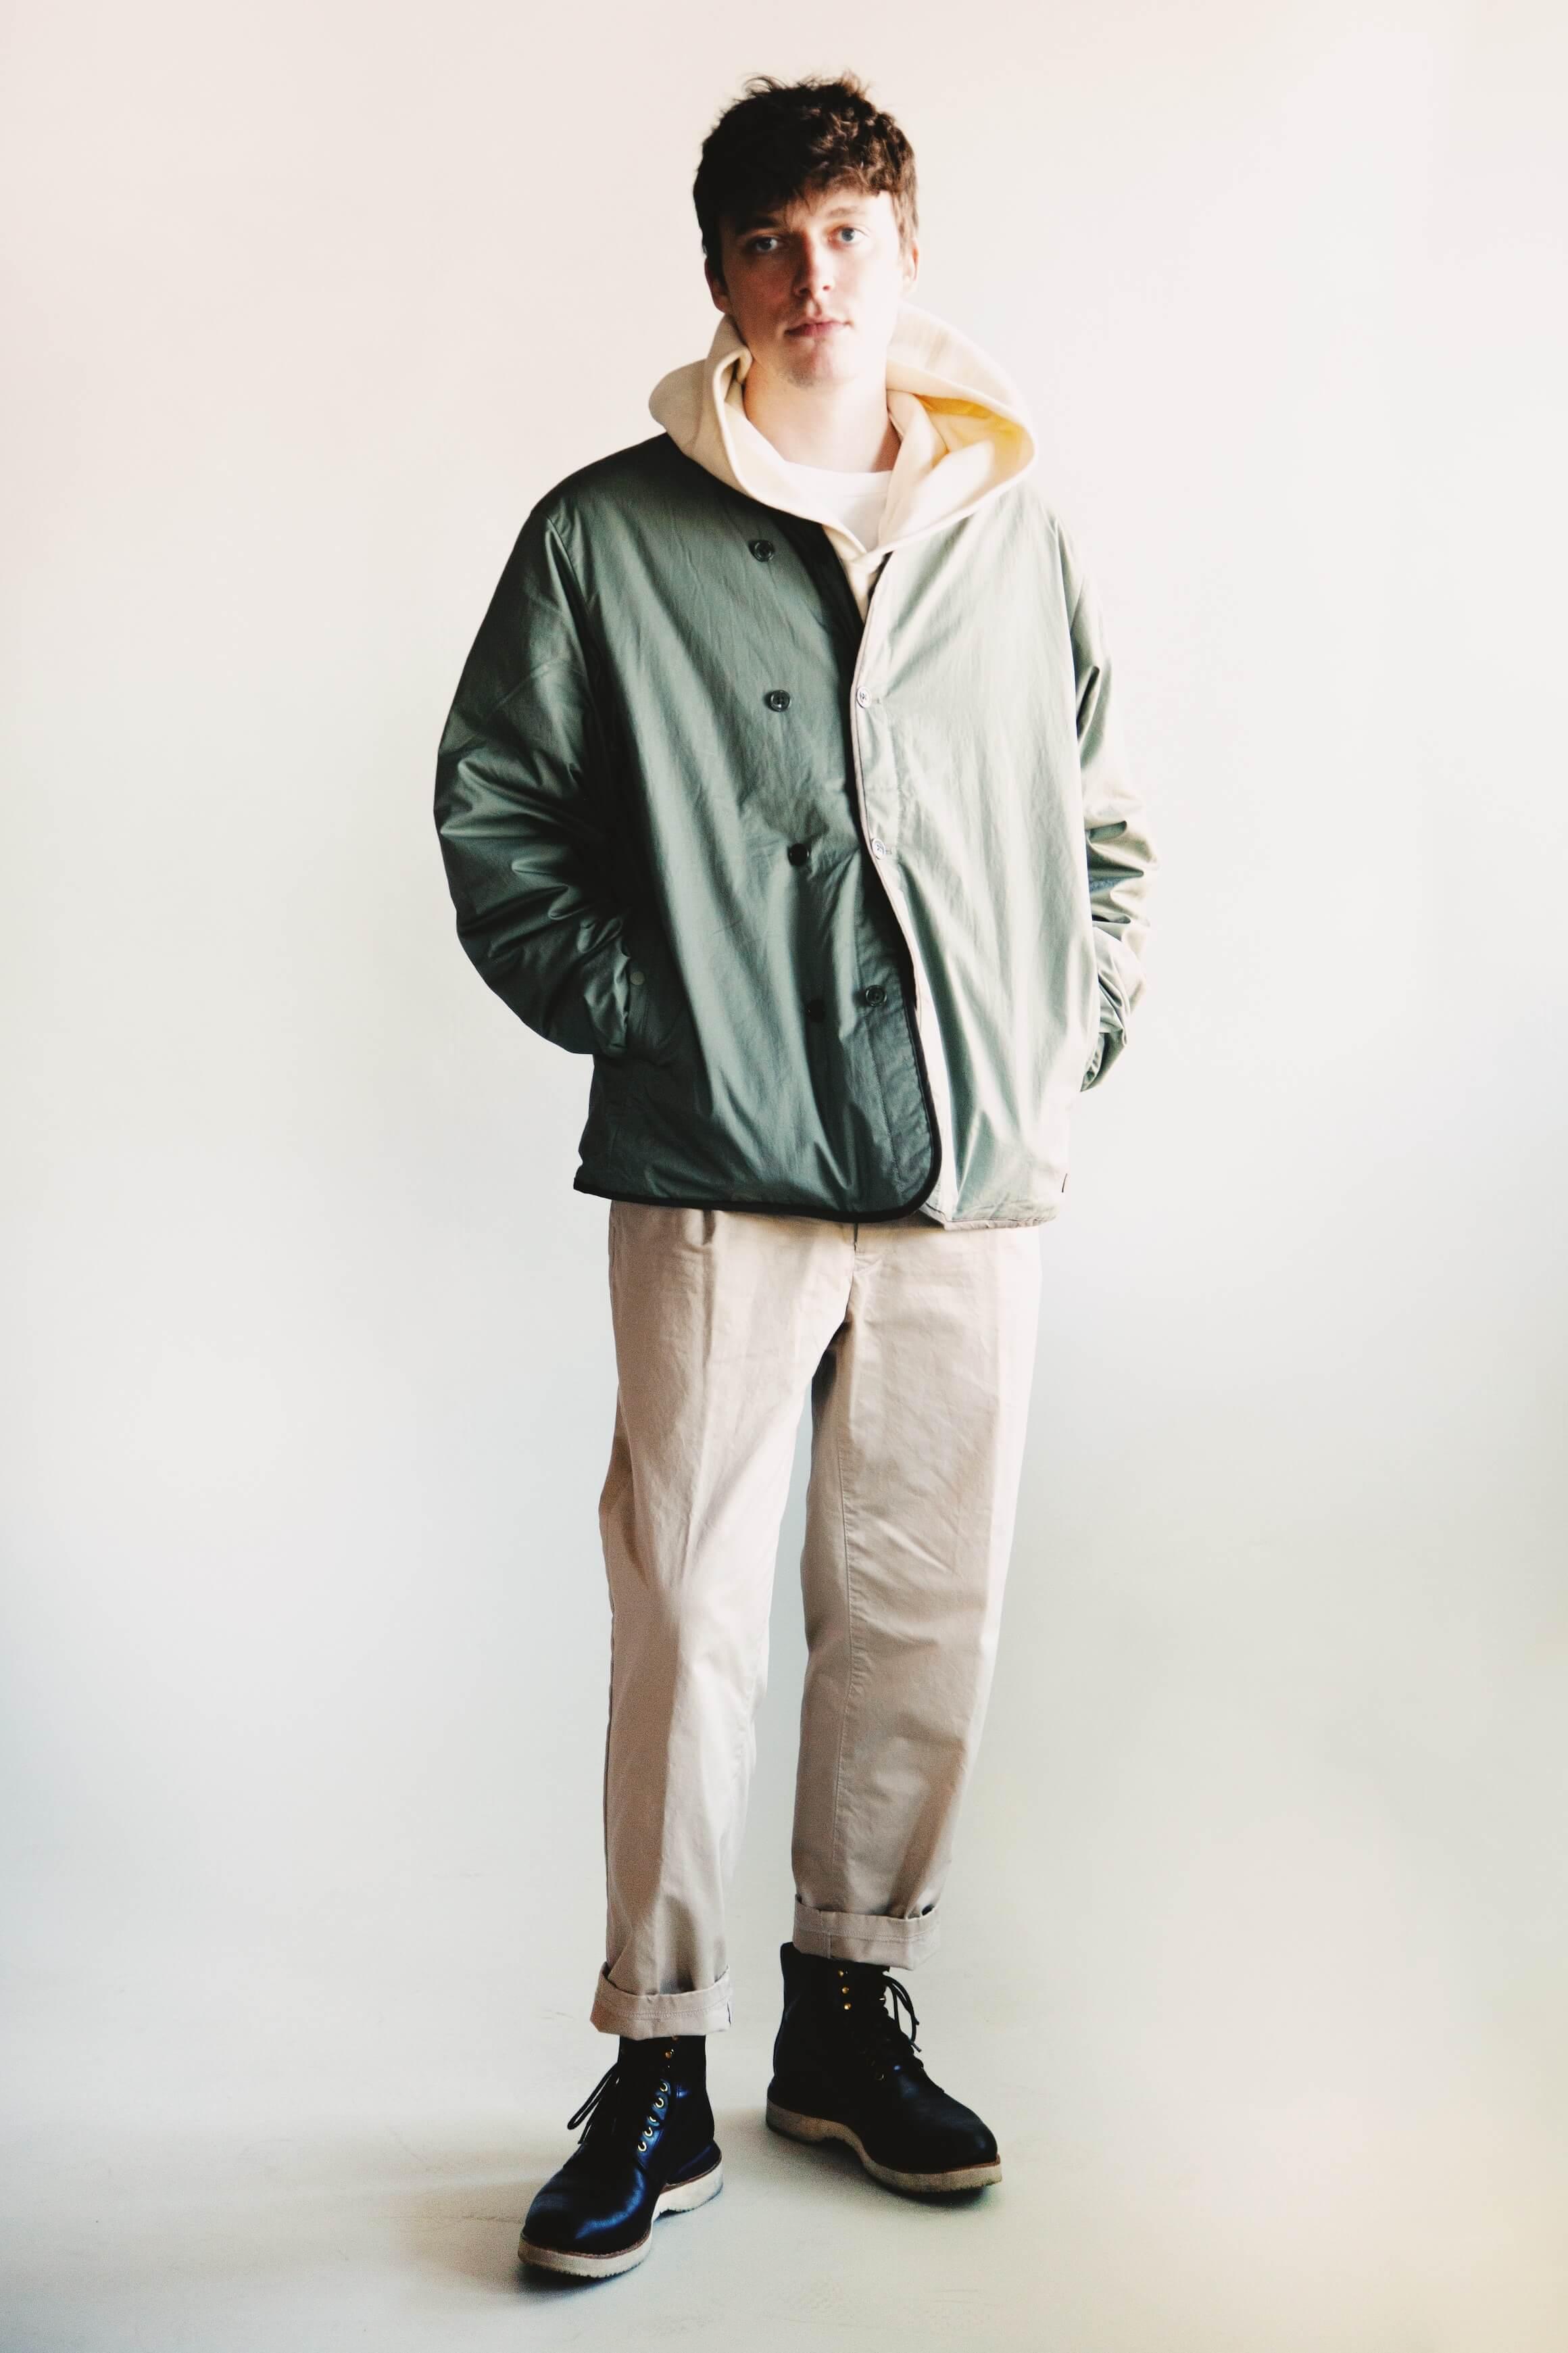 Nanamica down cardigan, visvim amplus hoodie po, beams plus single pleat twill pants and visvim virgil boots folk on body